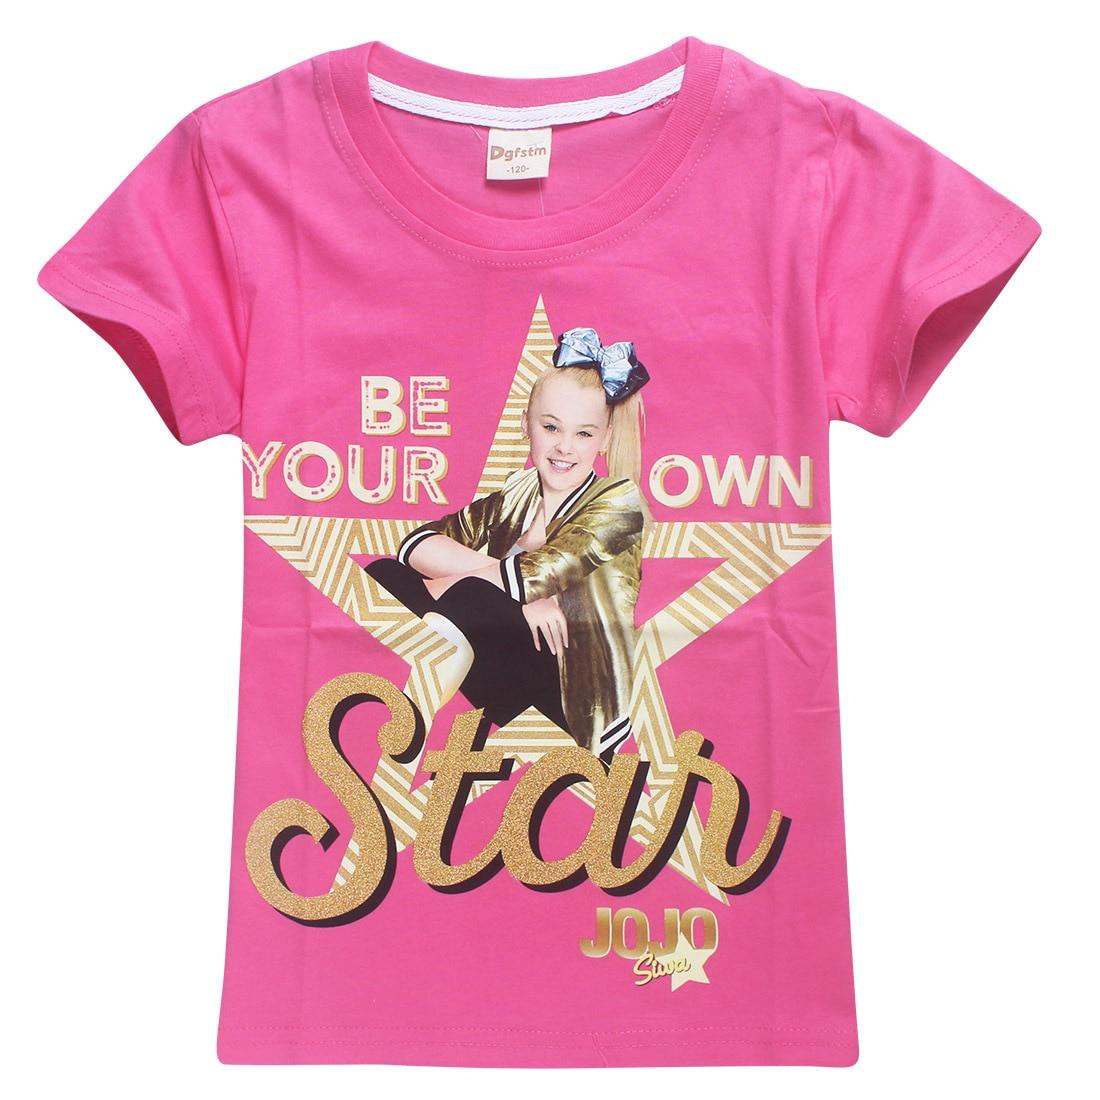 2018 New Summer Jojo Siwa Shirts Baby Girls Tshirts Short Sleeve T Shirts for Kids Bobo Choses T-shirt Child Sport Clothes 4-12Y 1